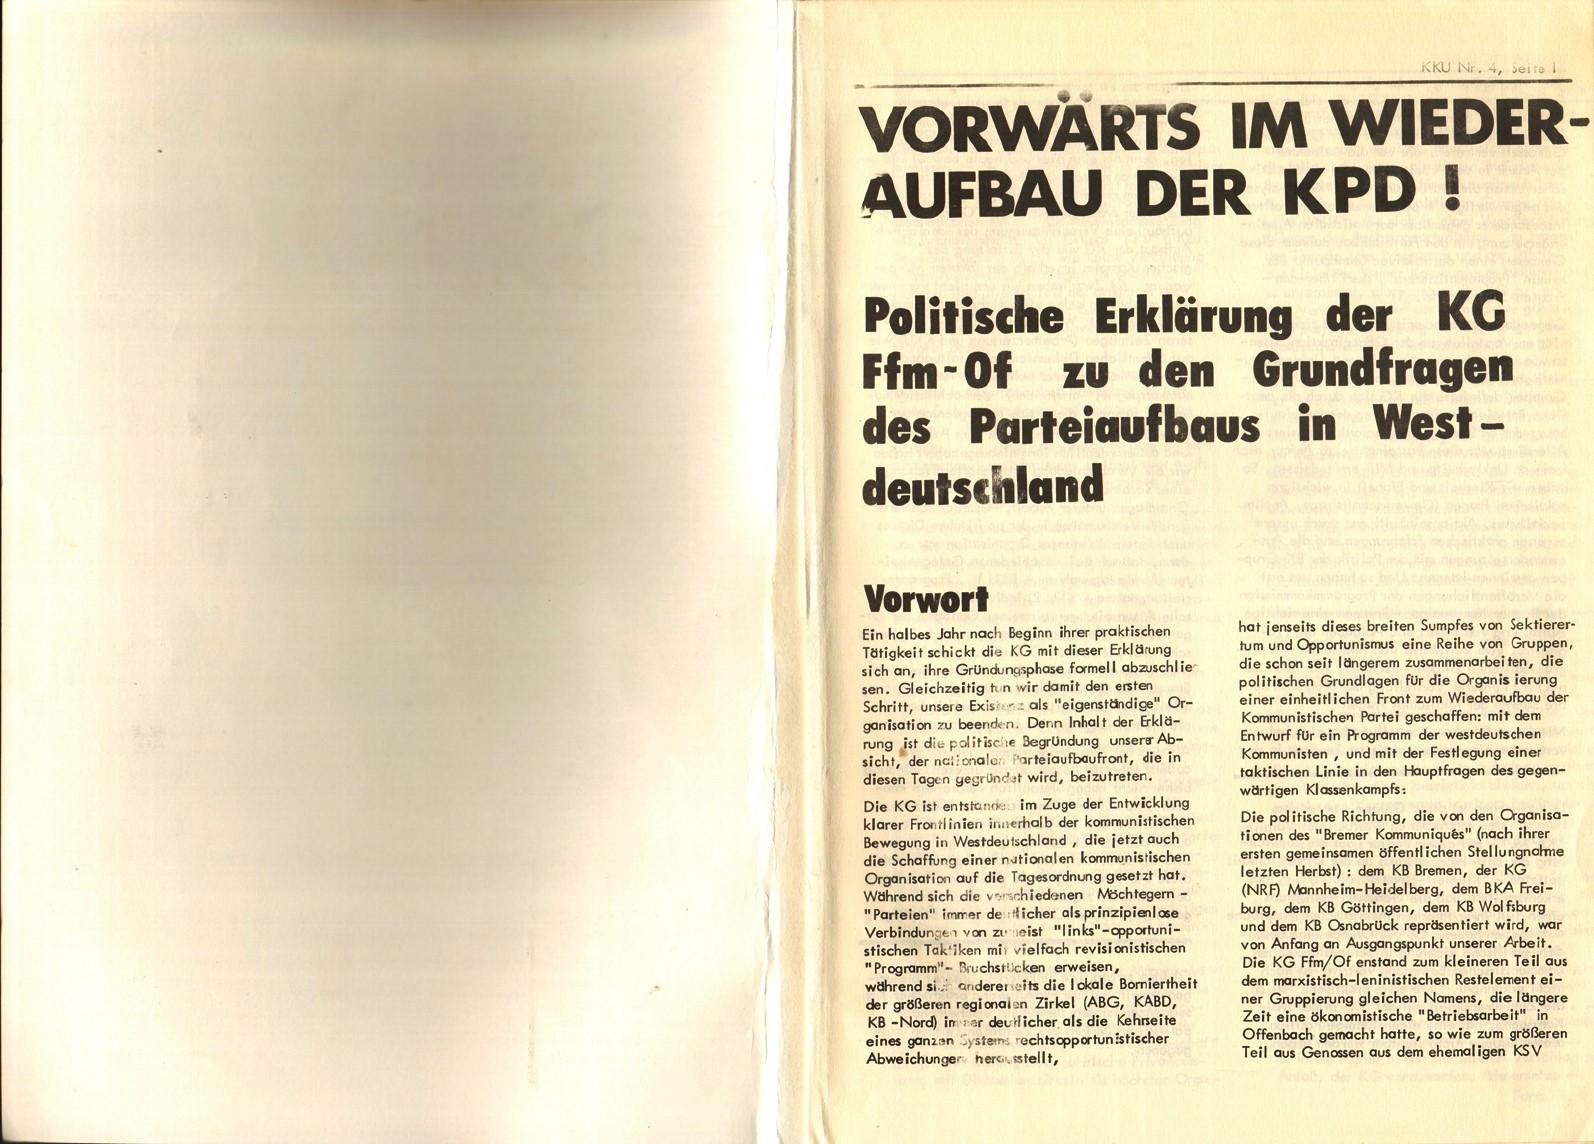 Frankfurt_Offenbach_KG_Kampf_Kritik_Umgestaltung_1973_04_05_02